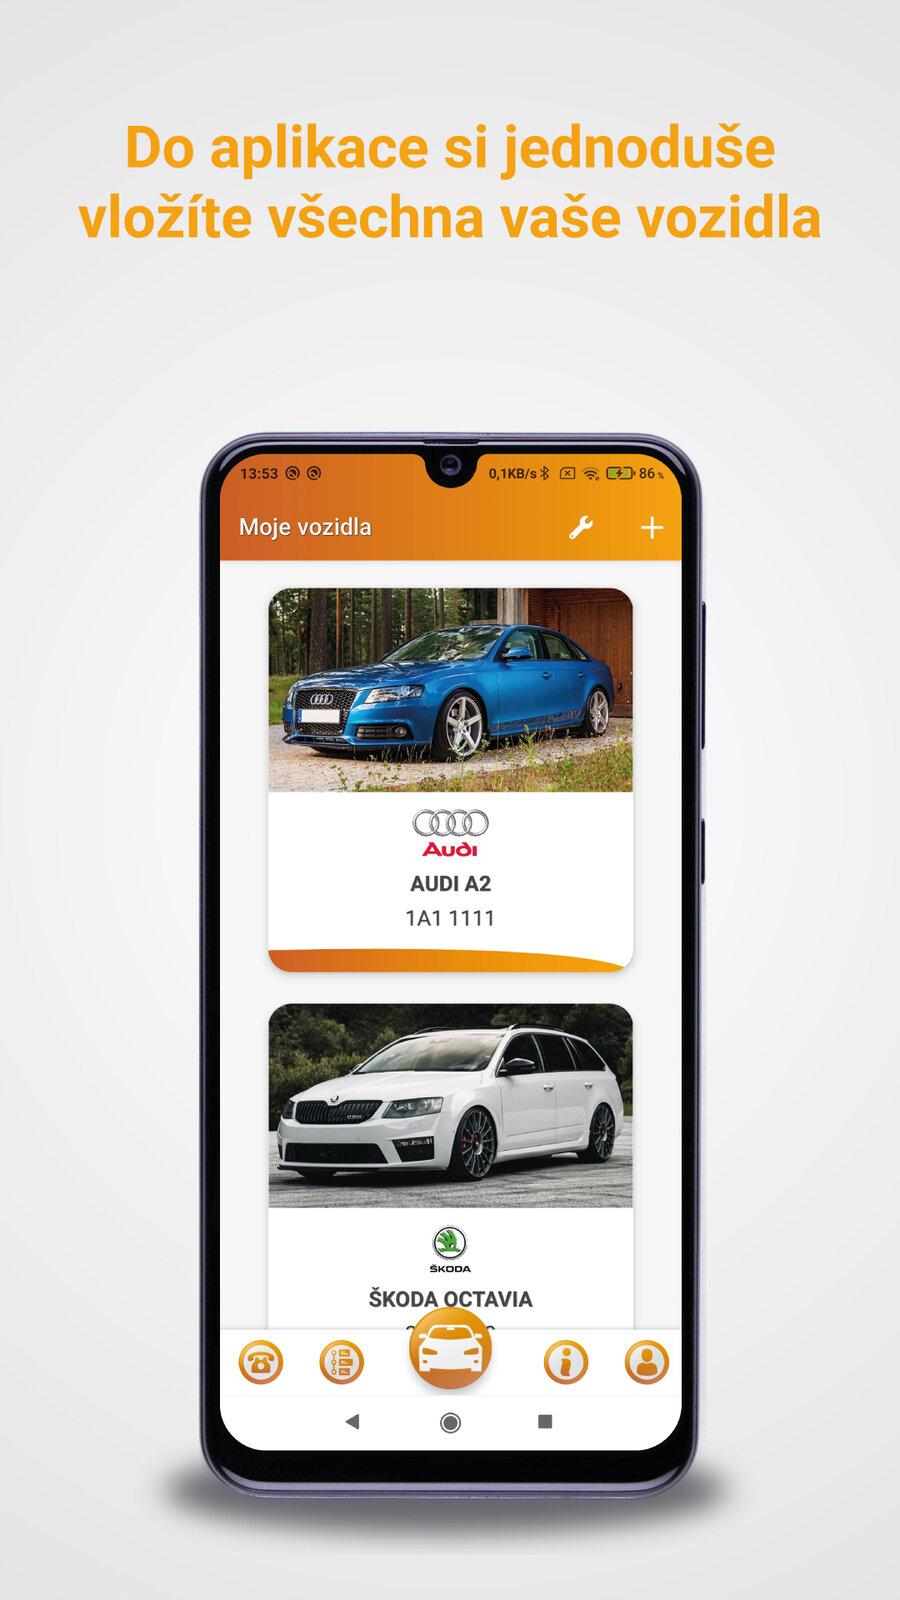 AutoMobil_Google Play Screen_CZ_1